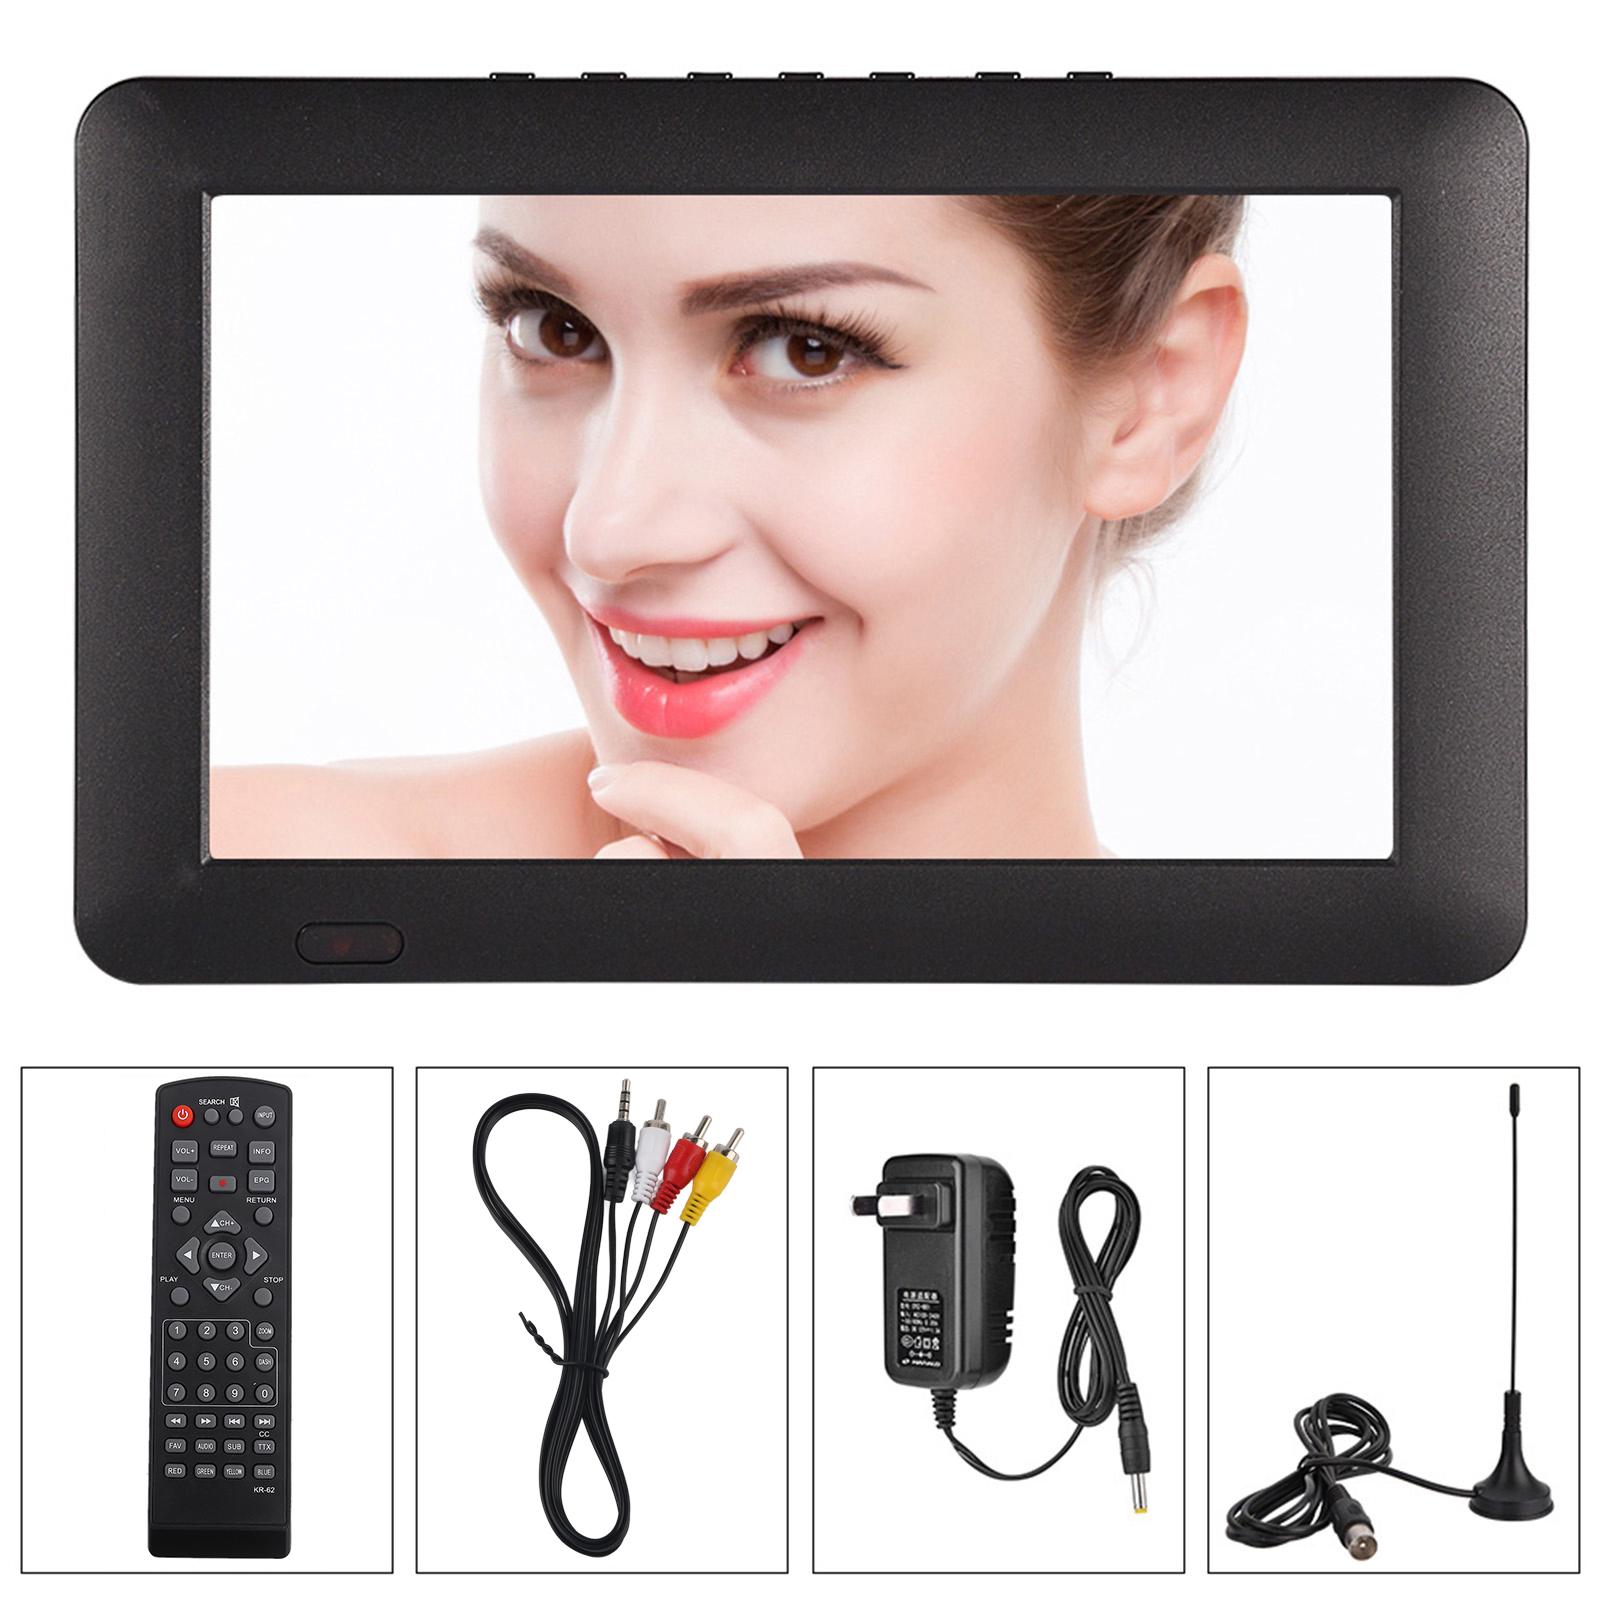 Portatil-Digital-Television-TV-Video-Player-1080P-HD-USB-TFT-HDMI-Multimedia